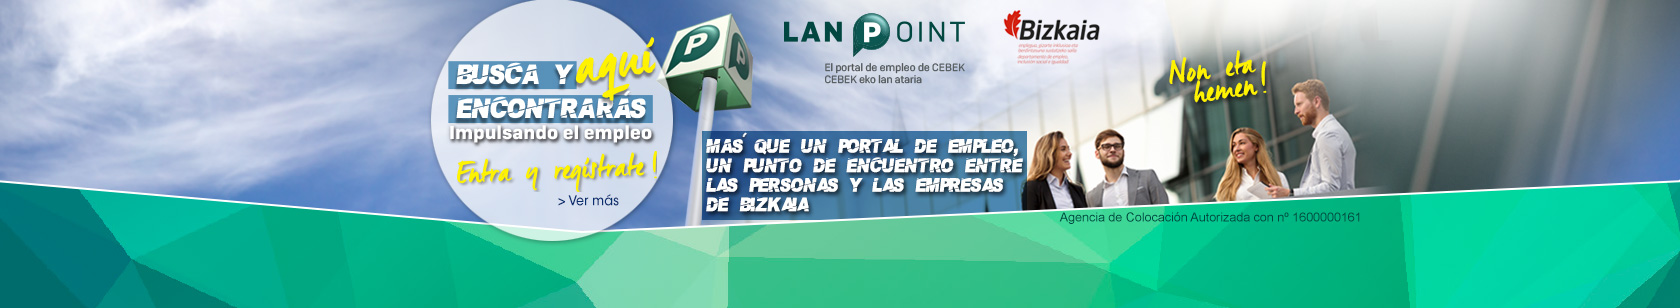 slider-portaldeempleo-dipu-marzo2018